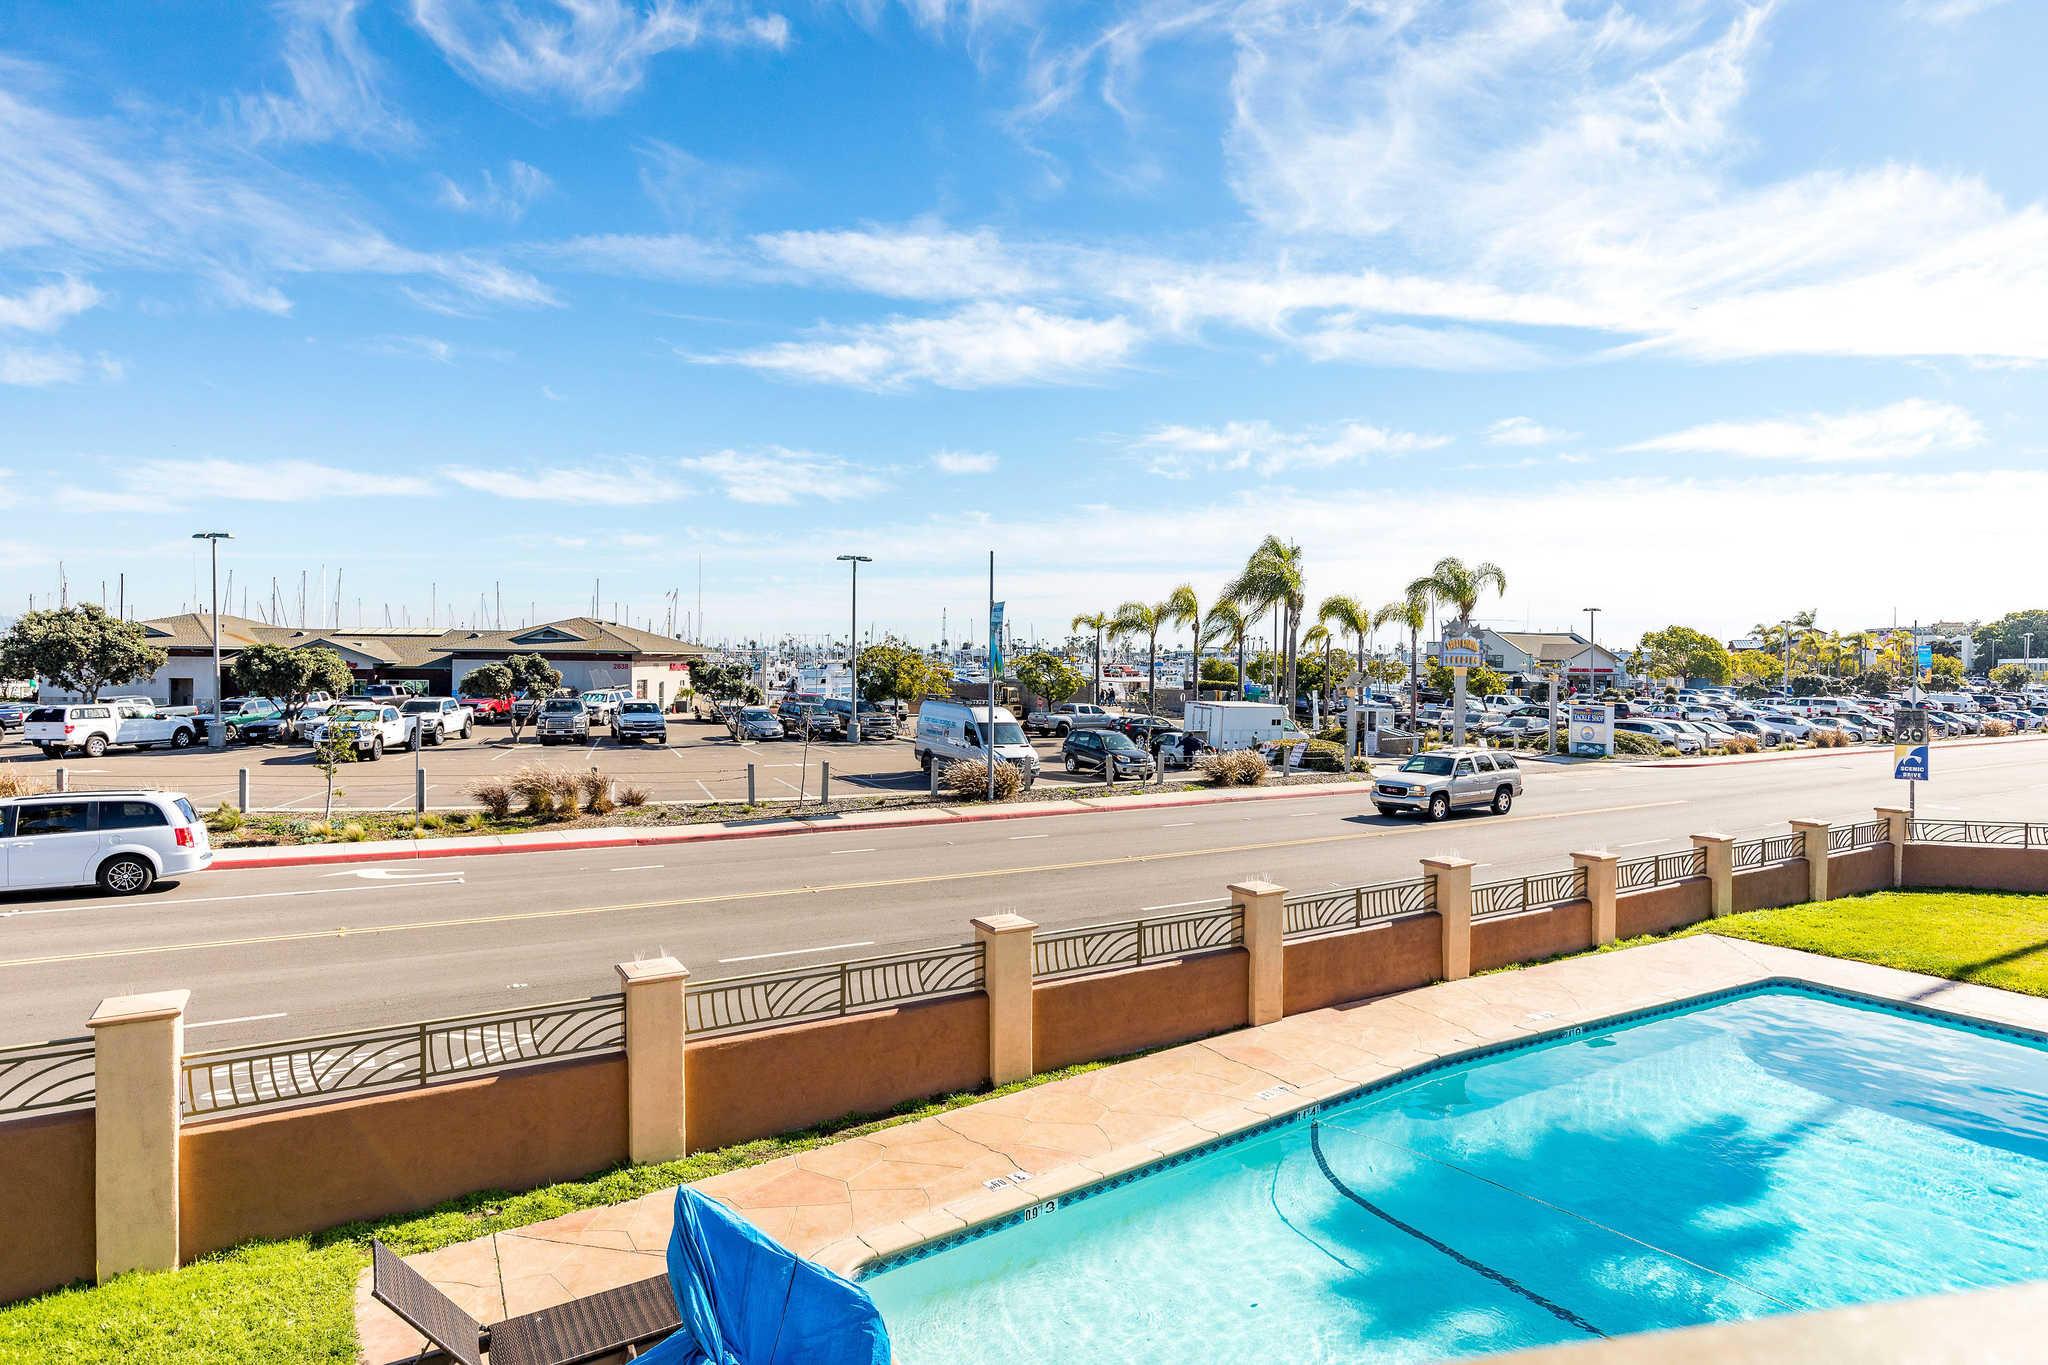 Comfort Inn San Diego At The Harbor image 22